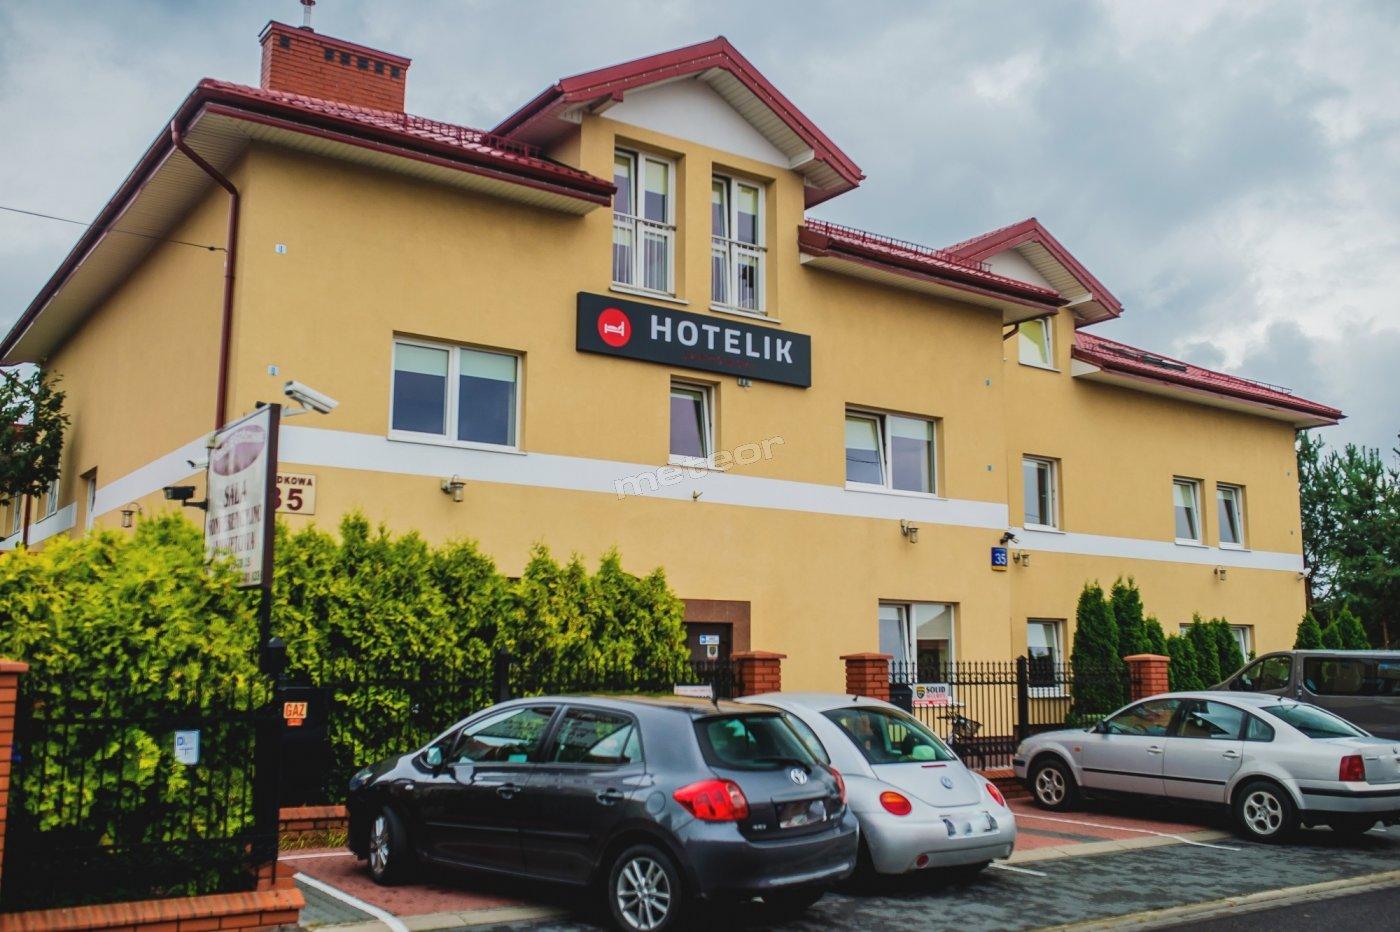 Hotelik Jankowski